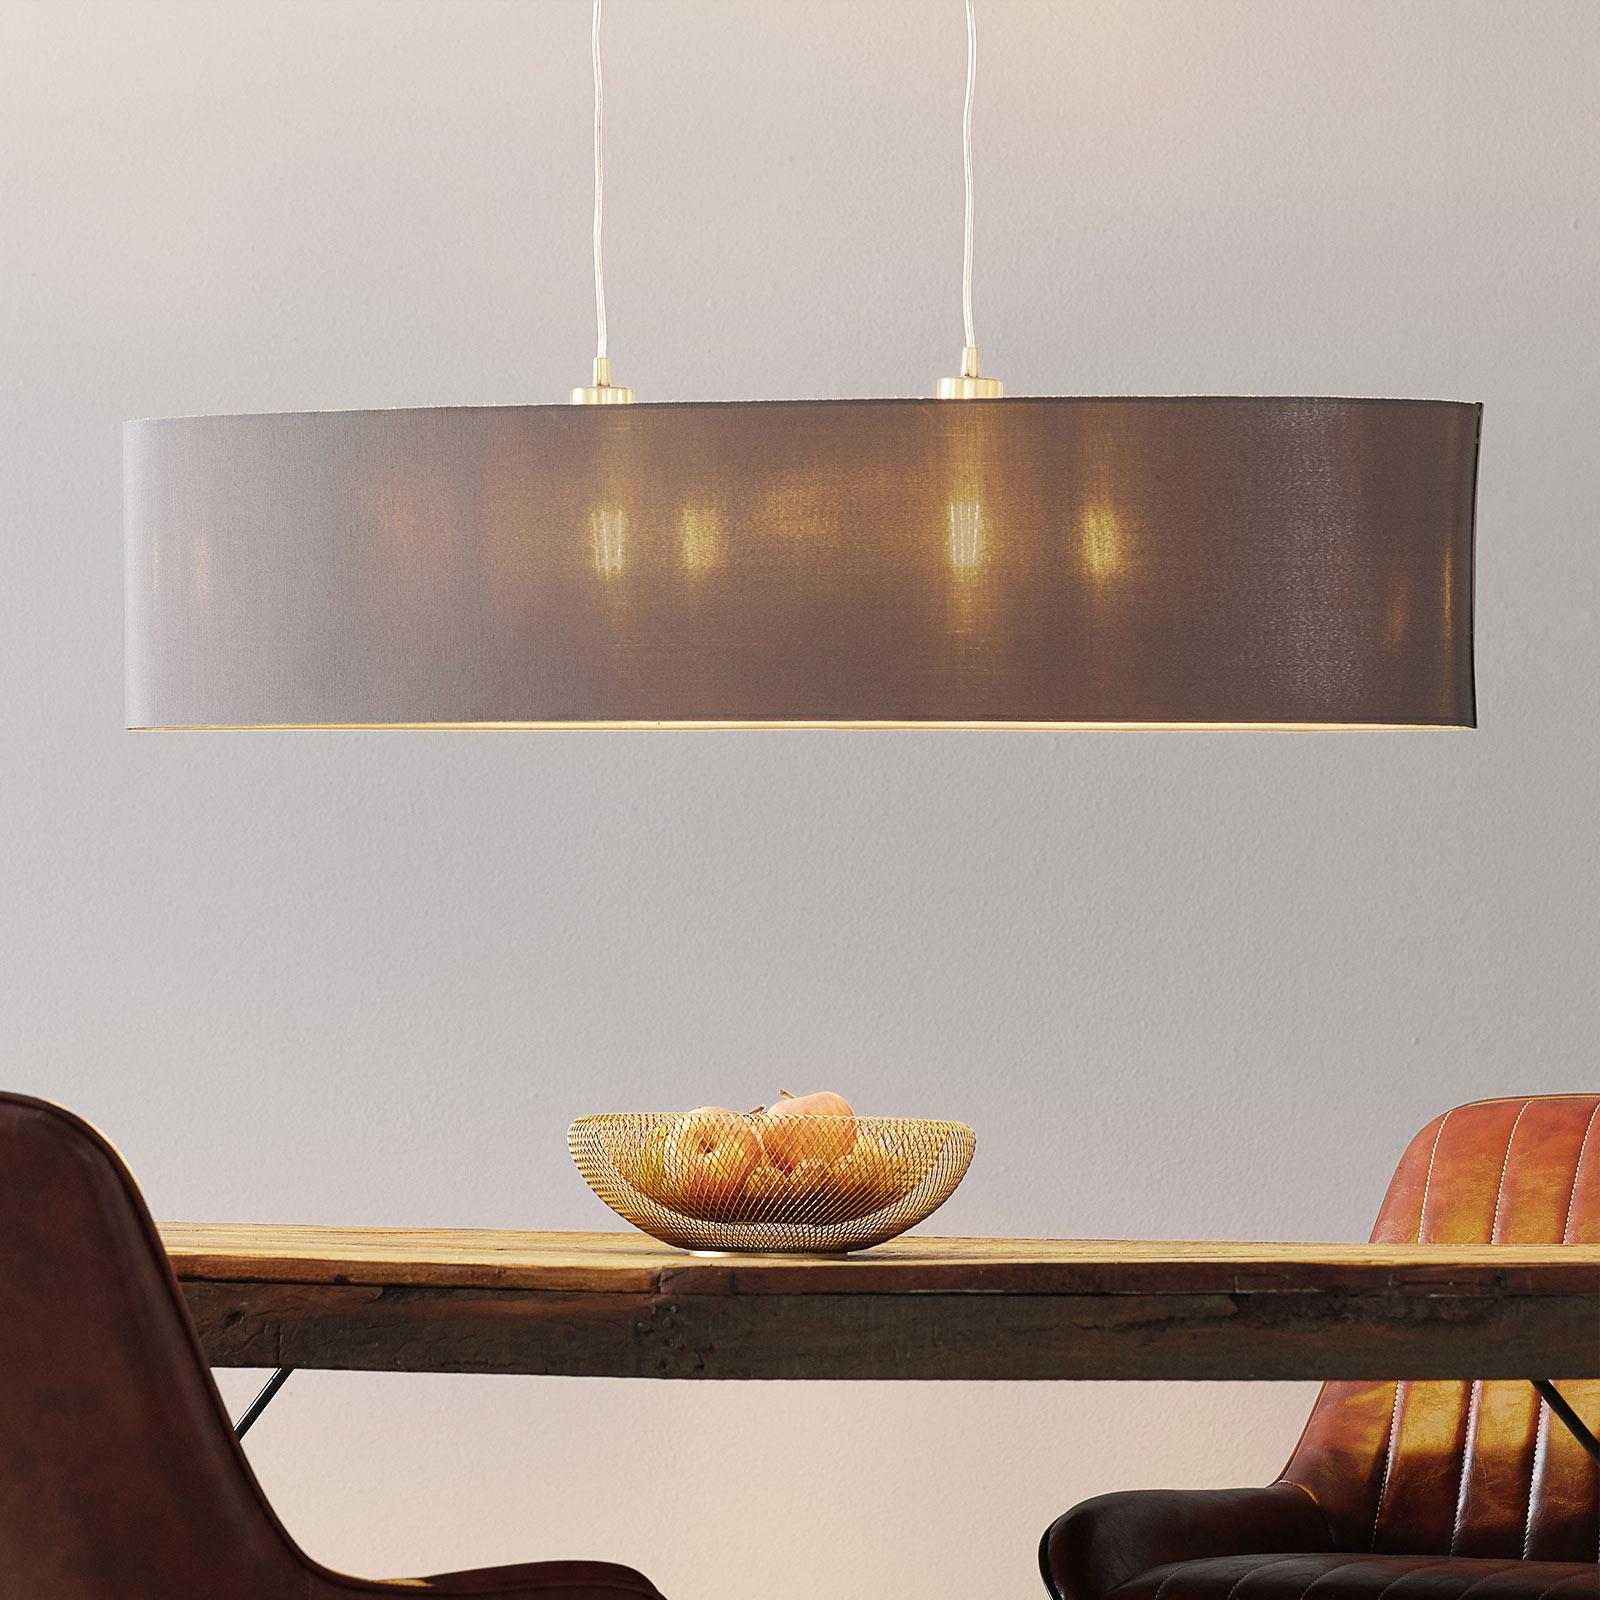 Maserlo fabric hanging light oval cappuccino 100cm_3031704_1